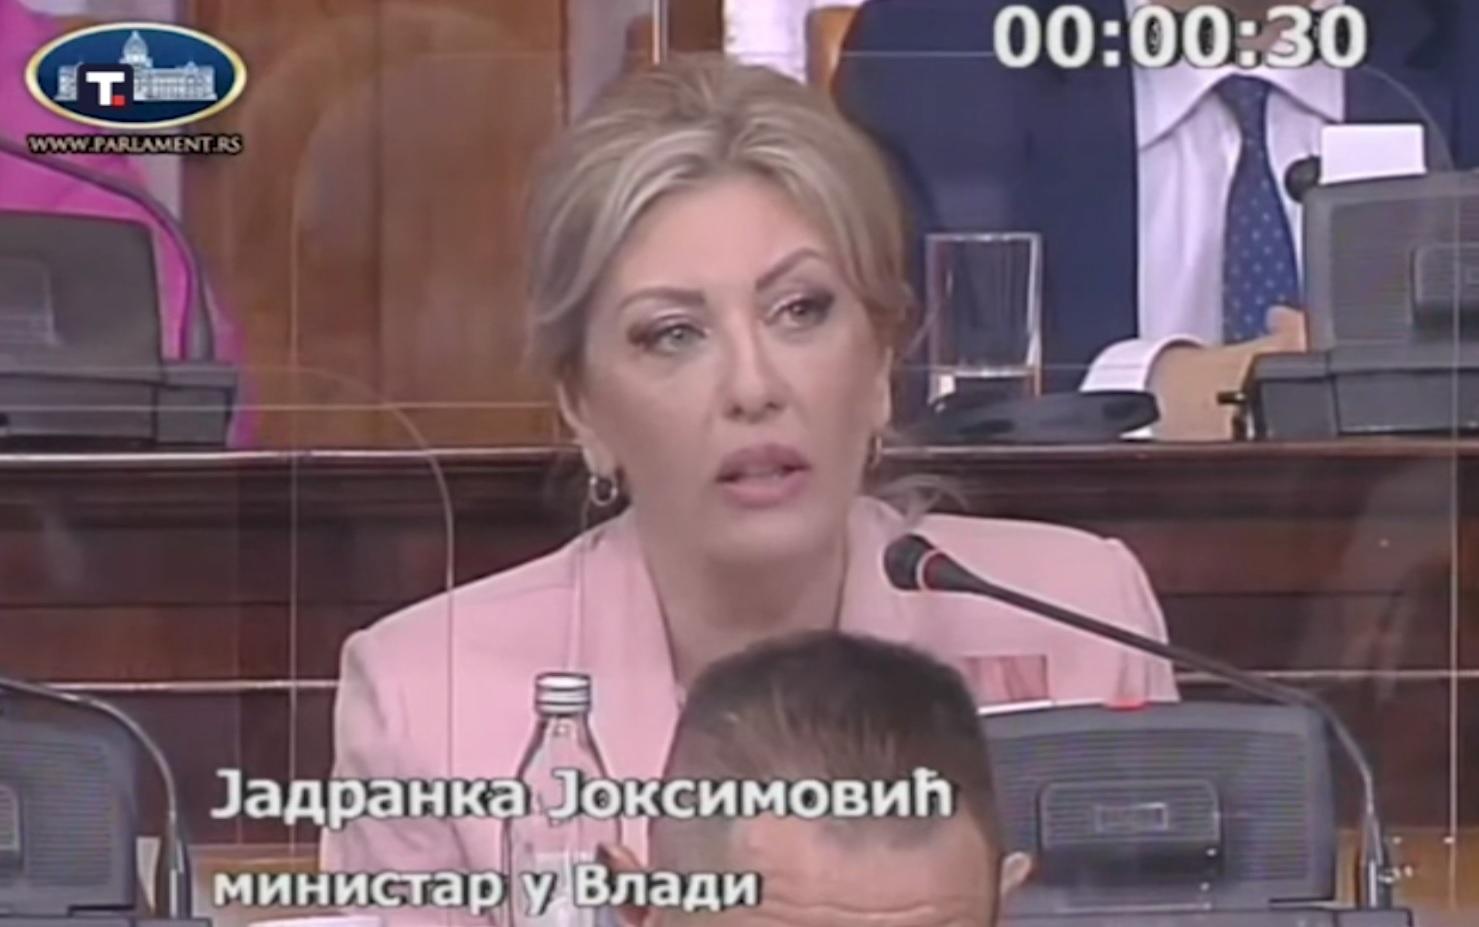 J. Joksimović: IPA 3 additional incentive for the citizens of Serbia